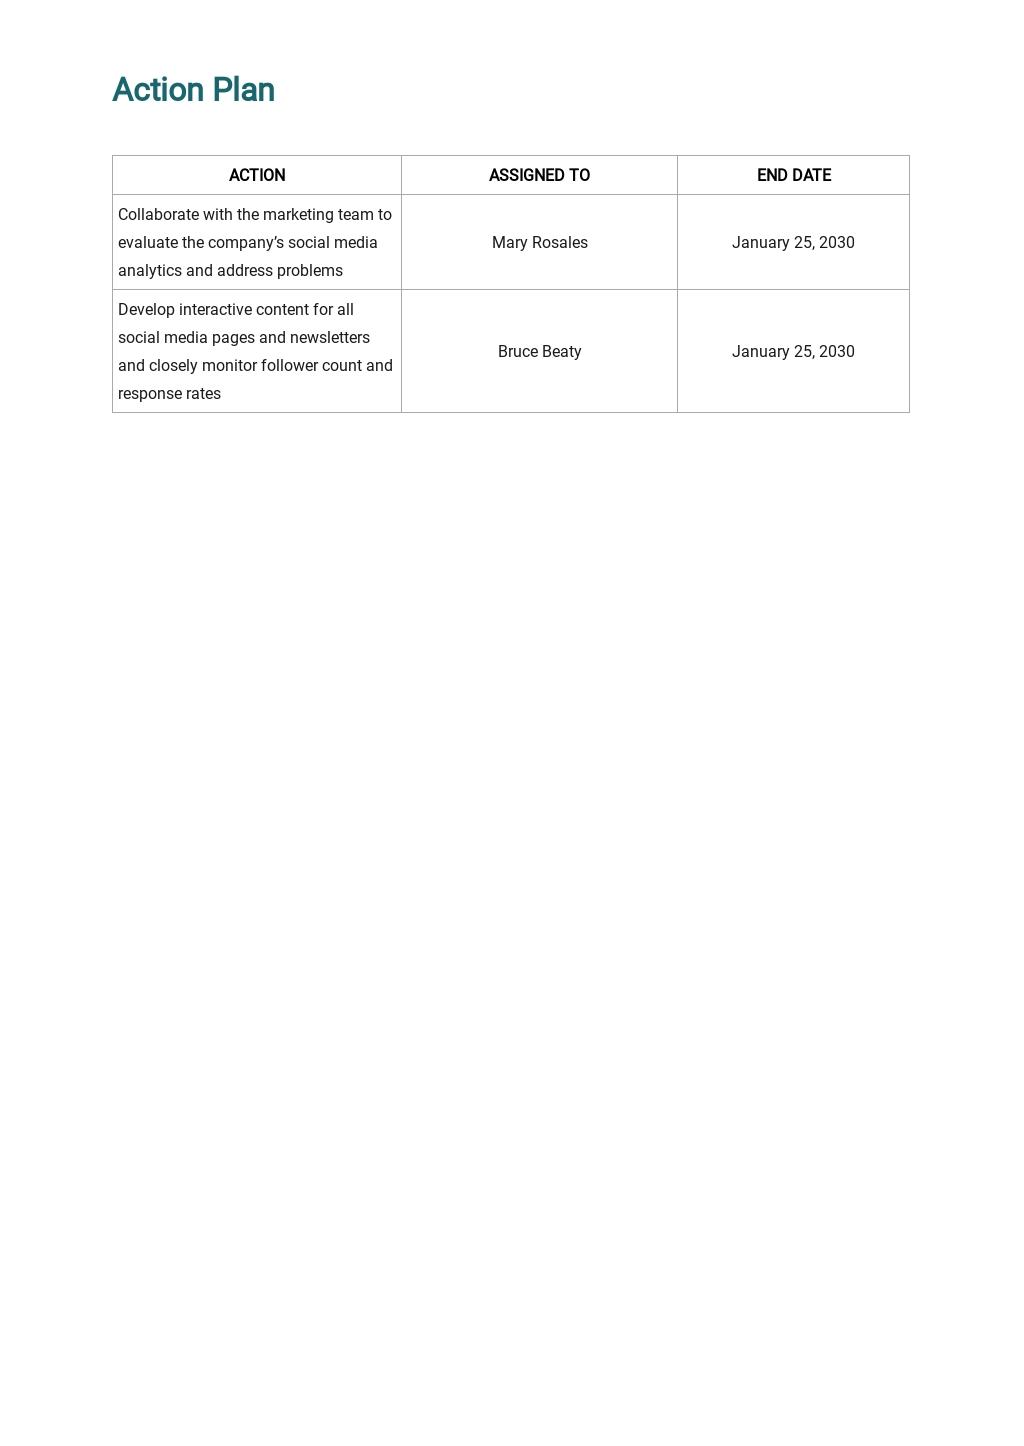 Real Estate / Property Strategic Plan Template 4.jpe